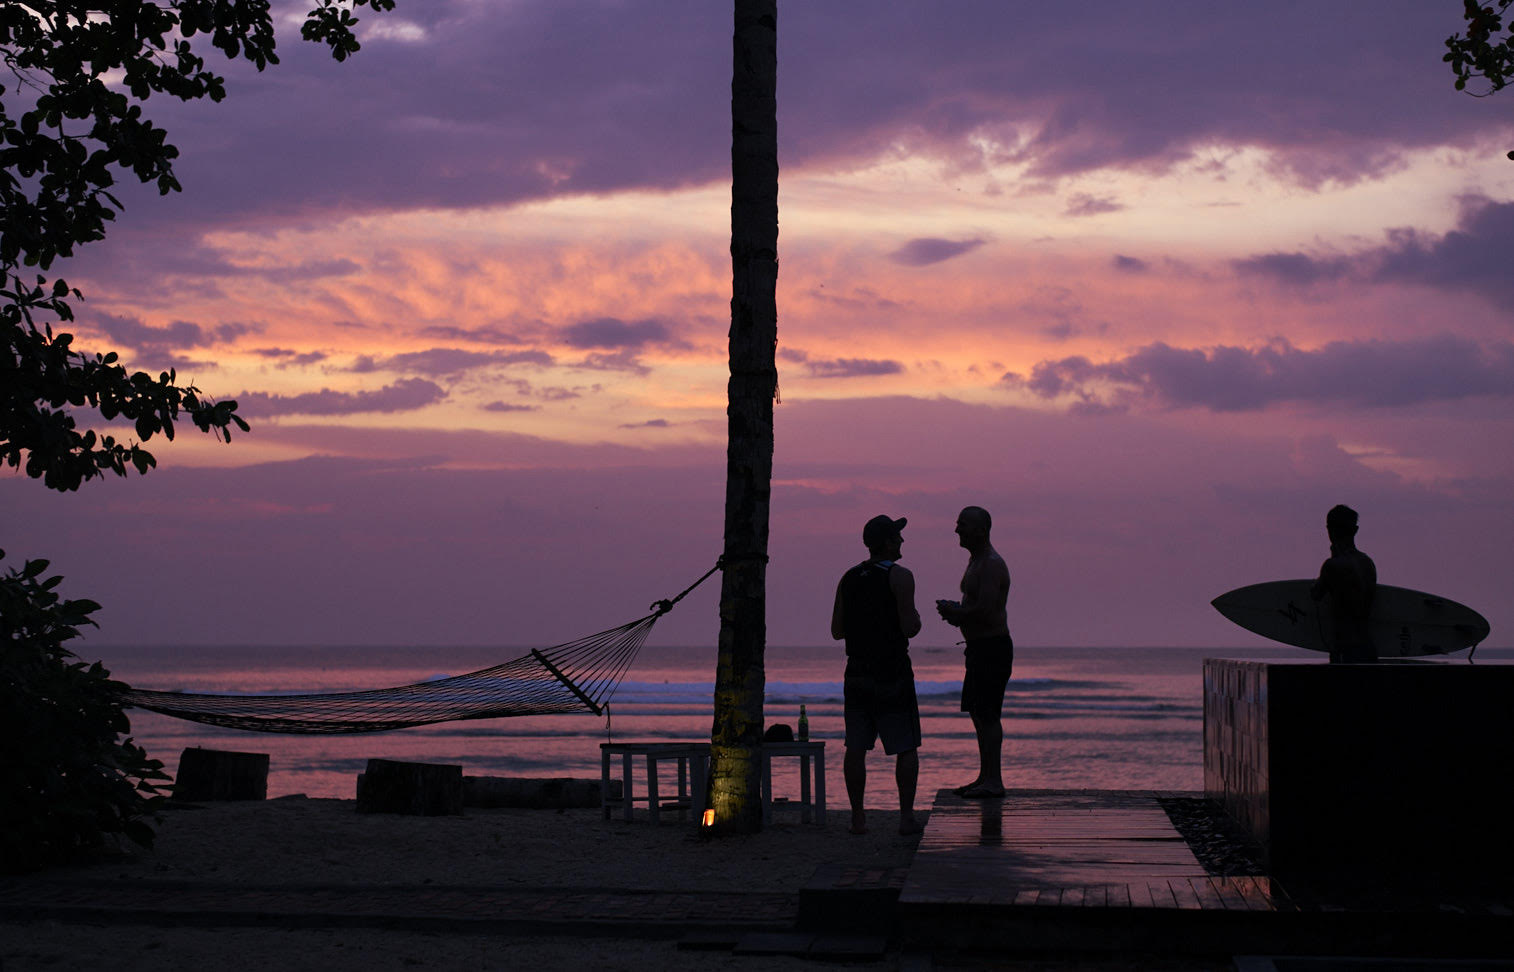 Grant Smith - Sunset on beach